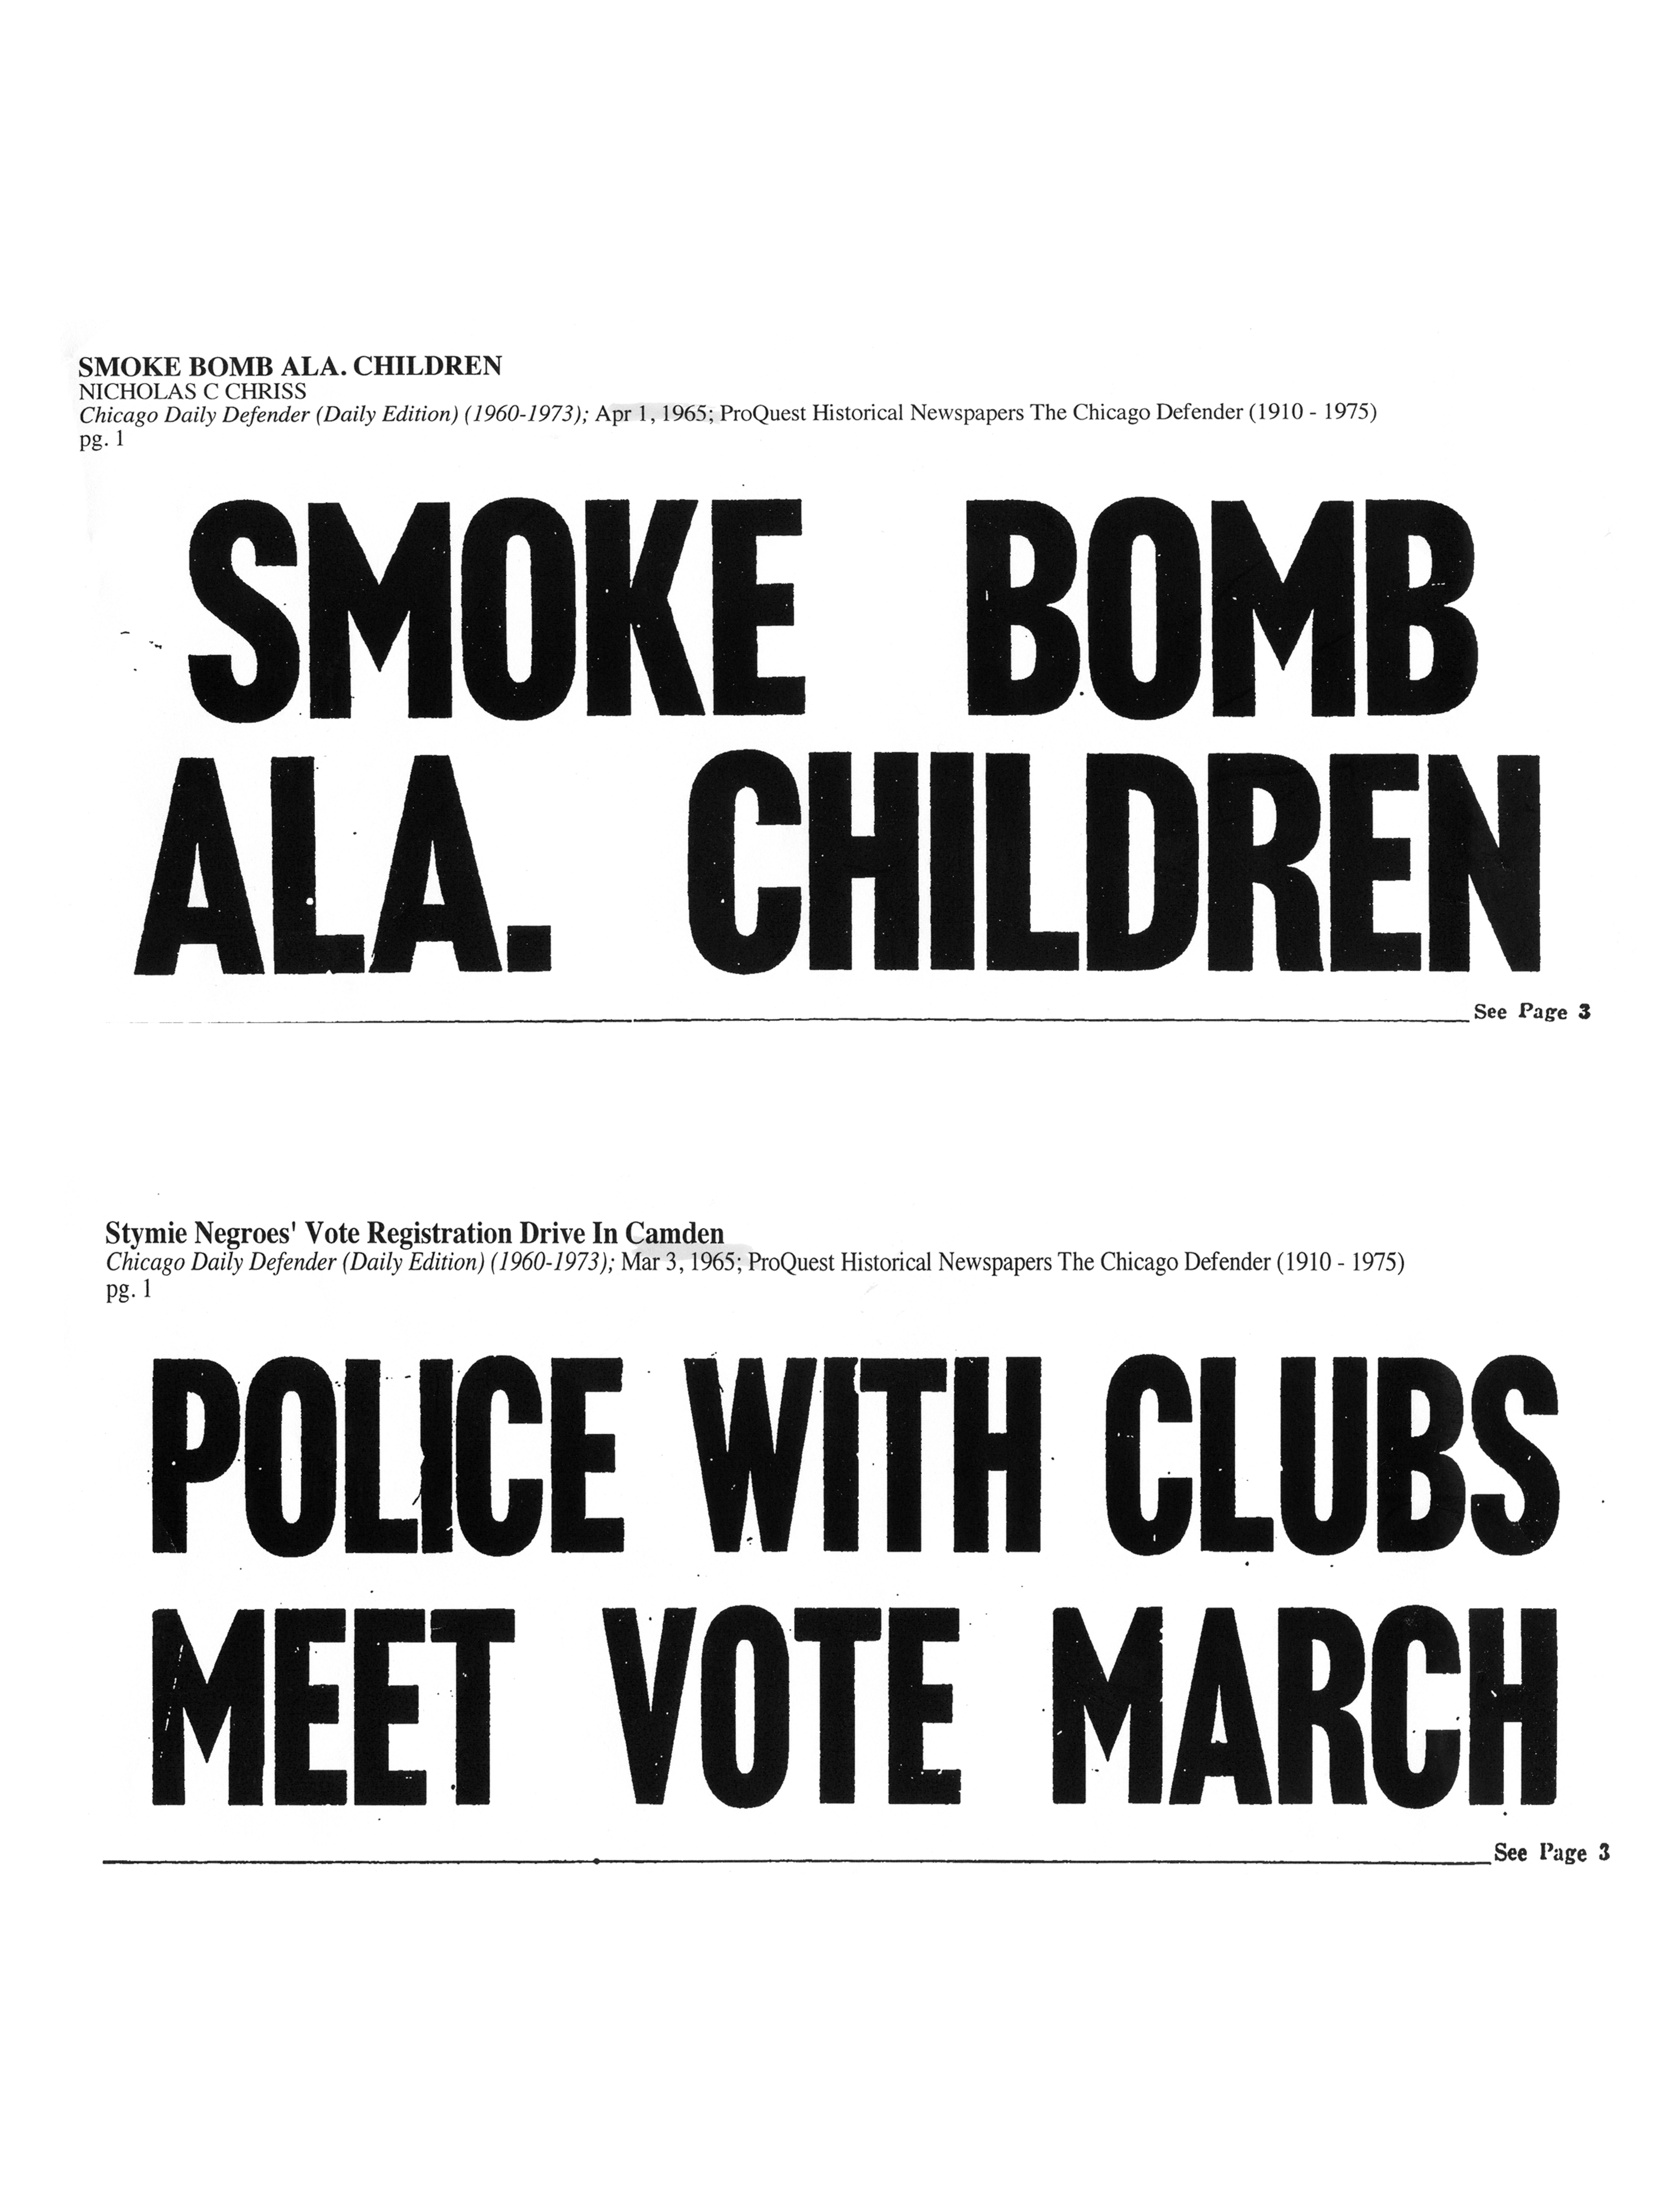 Alabama wilcox county camden - February 26 1965 Marion Al 26